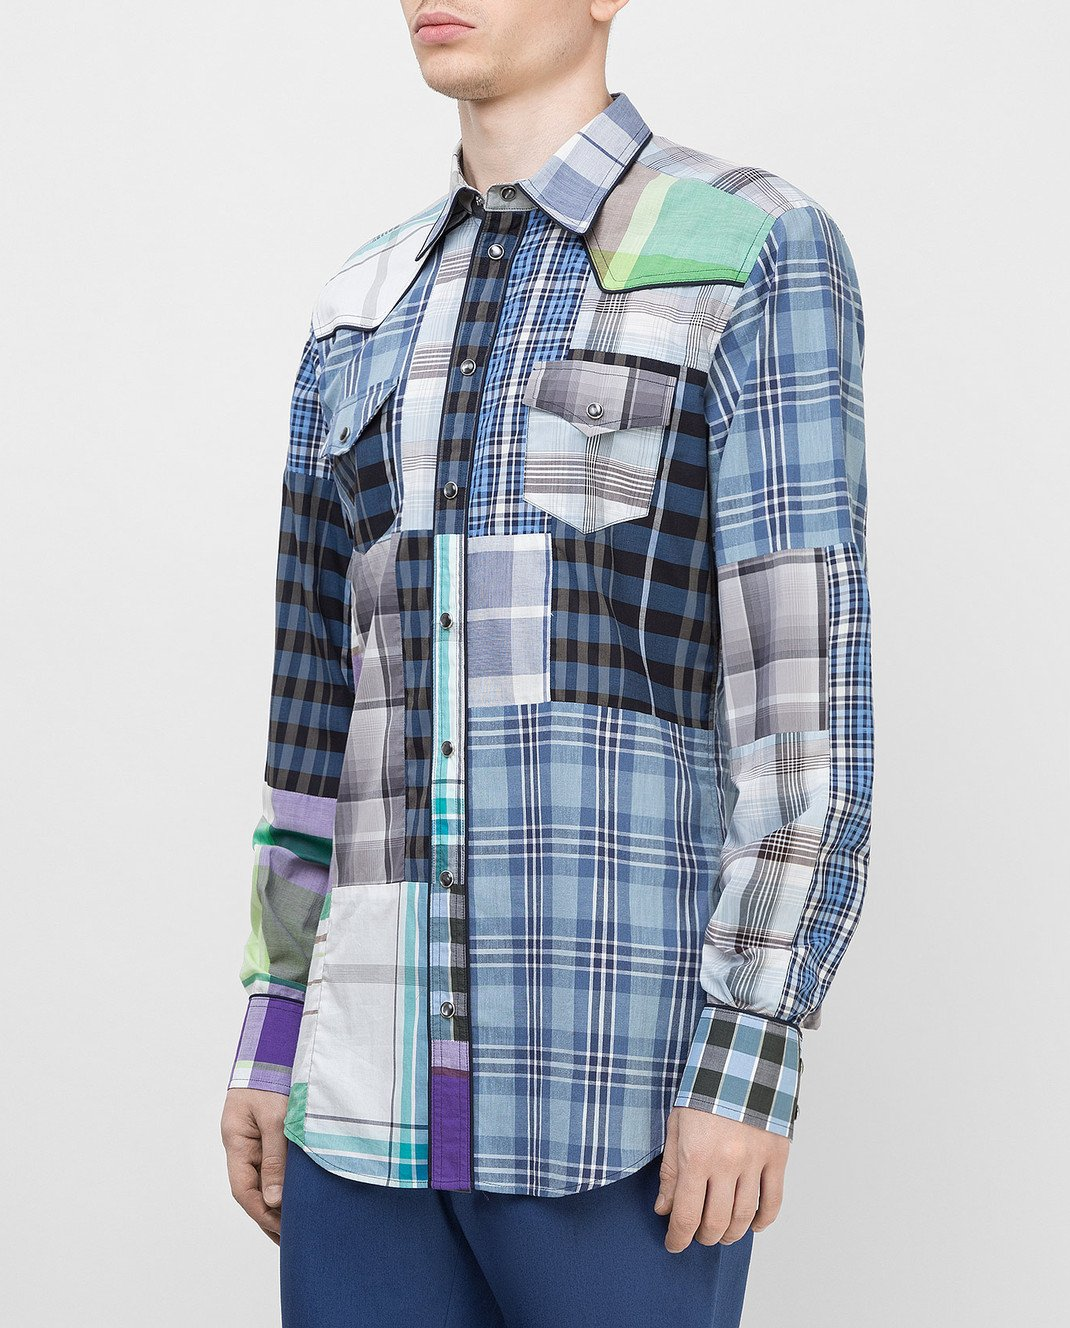 Dolce&Gabbana Синяя рубашка G5CS8TG9Y16 изображение 3